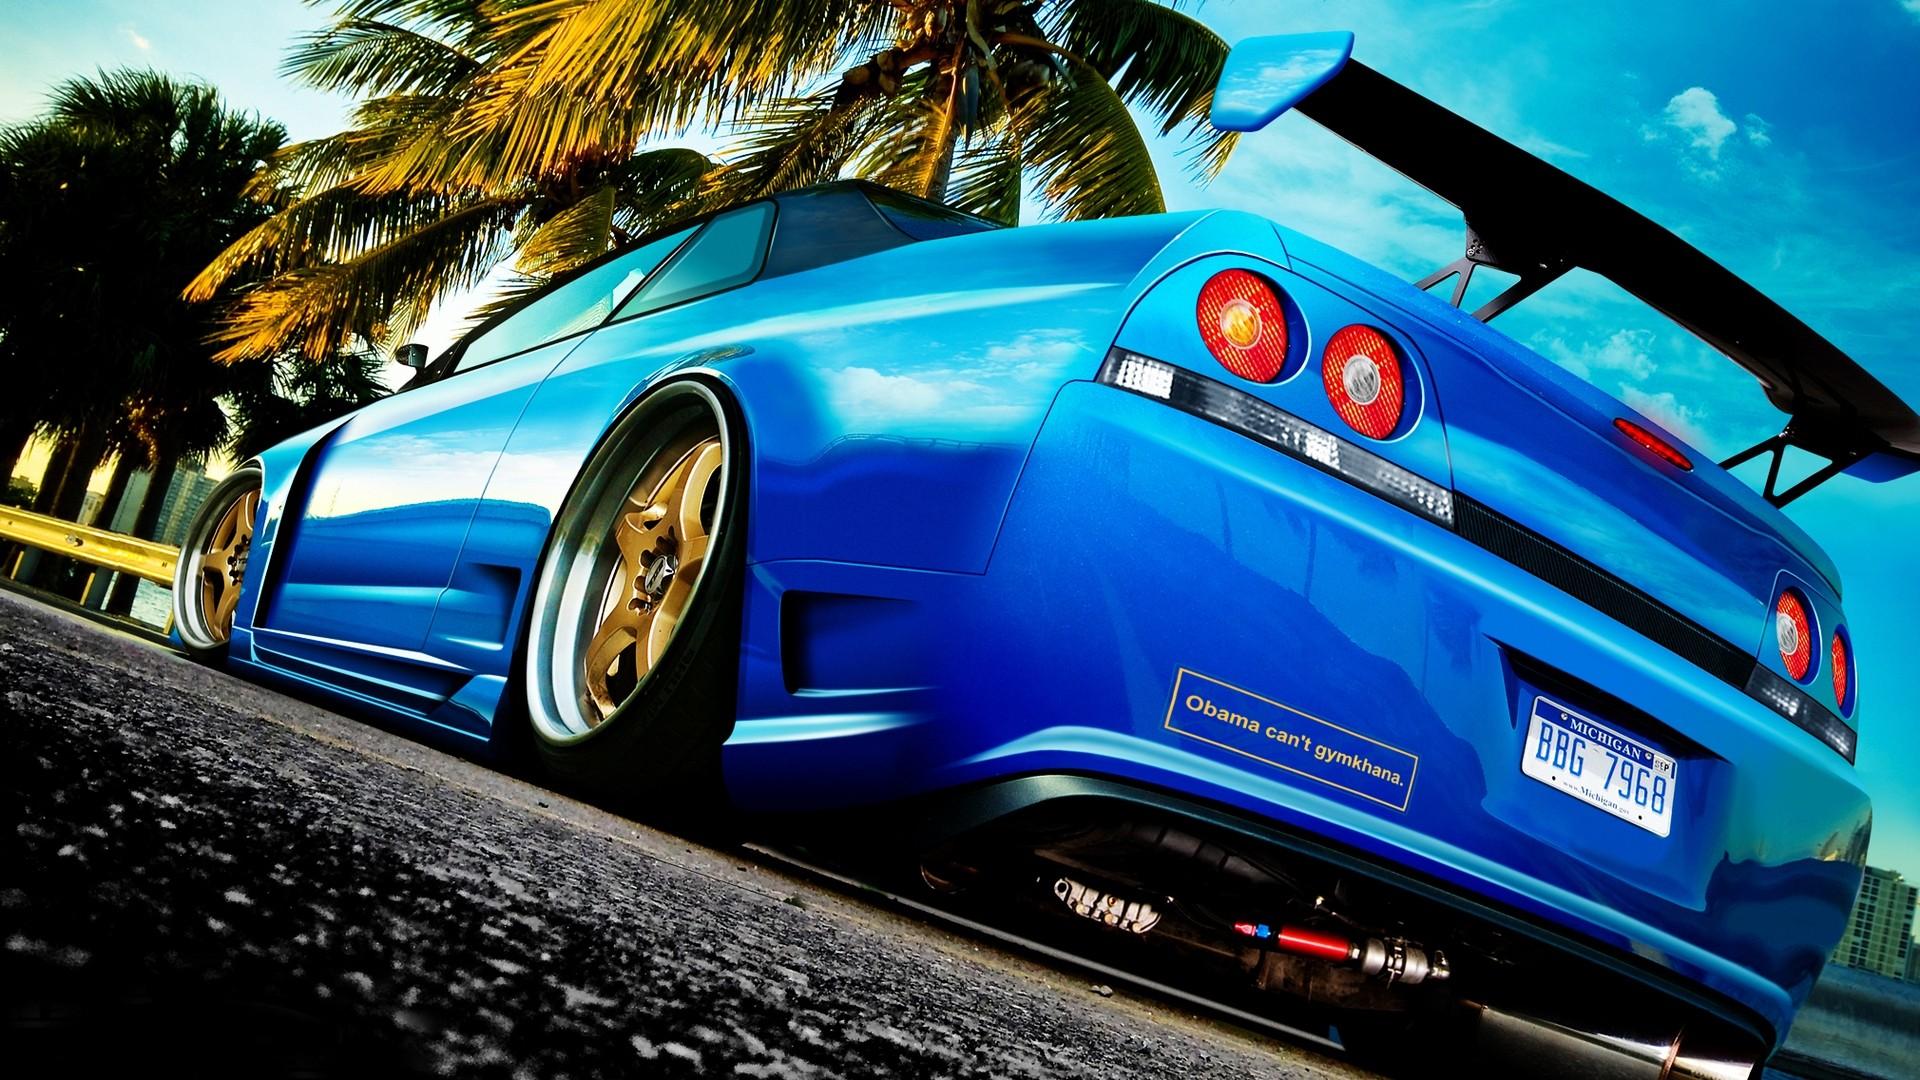 Blue Car HD Wallpapers : Blue car looks cool wallpaper